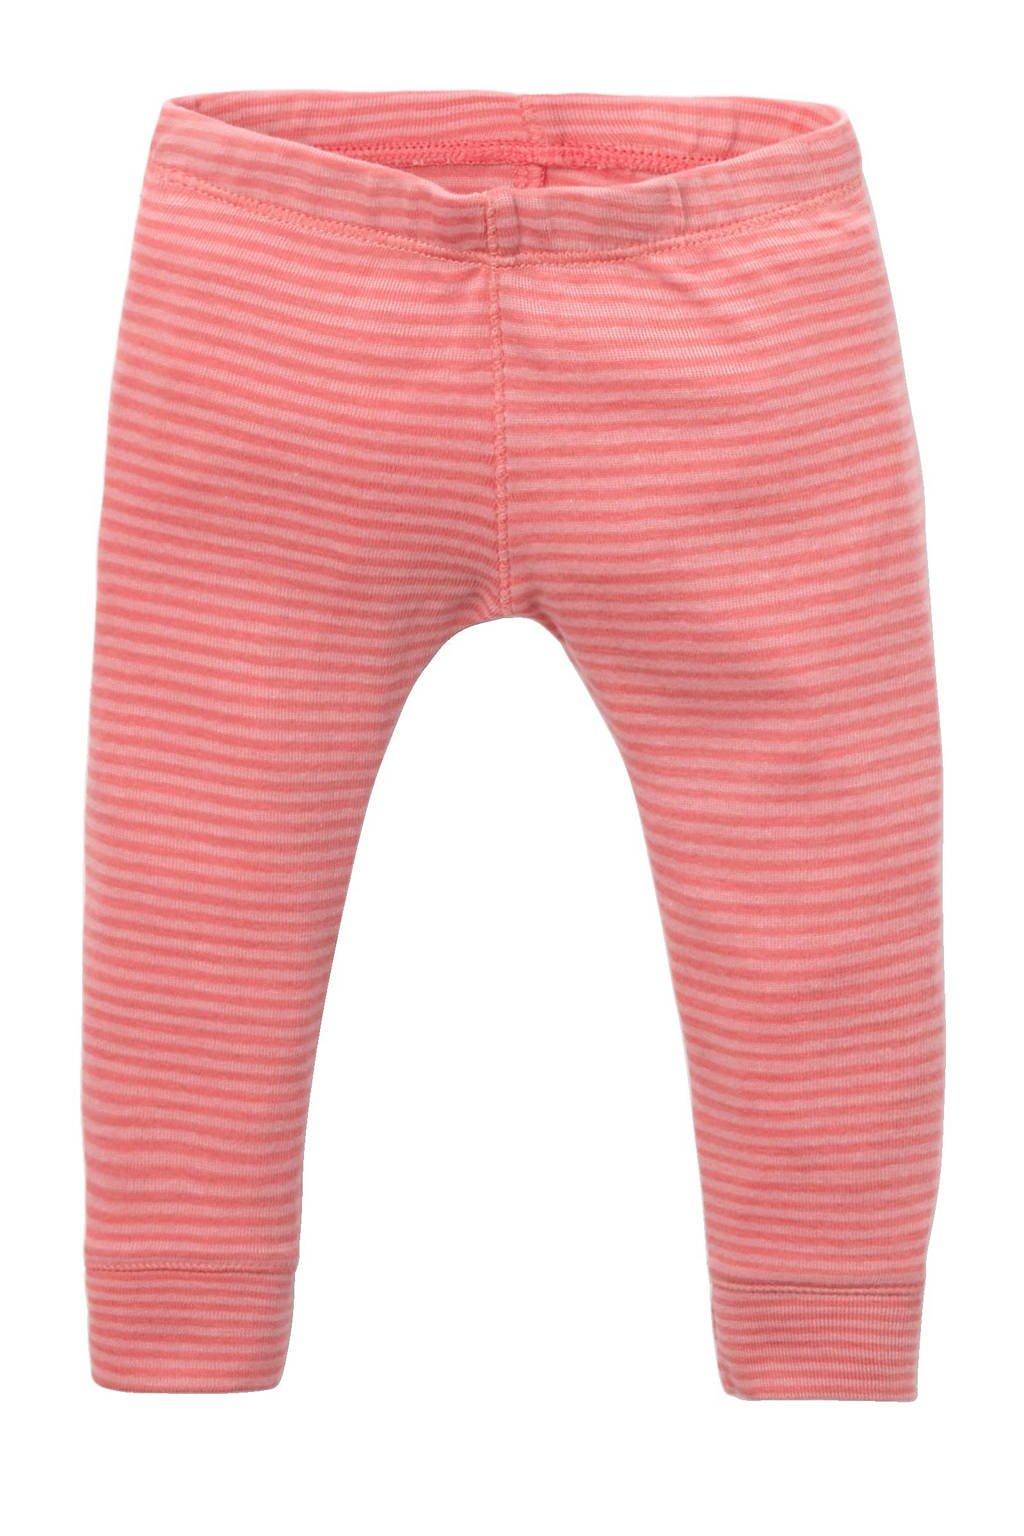 IMPS&ELFS gestreepte legging roze, Roze